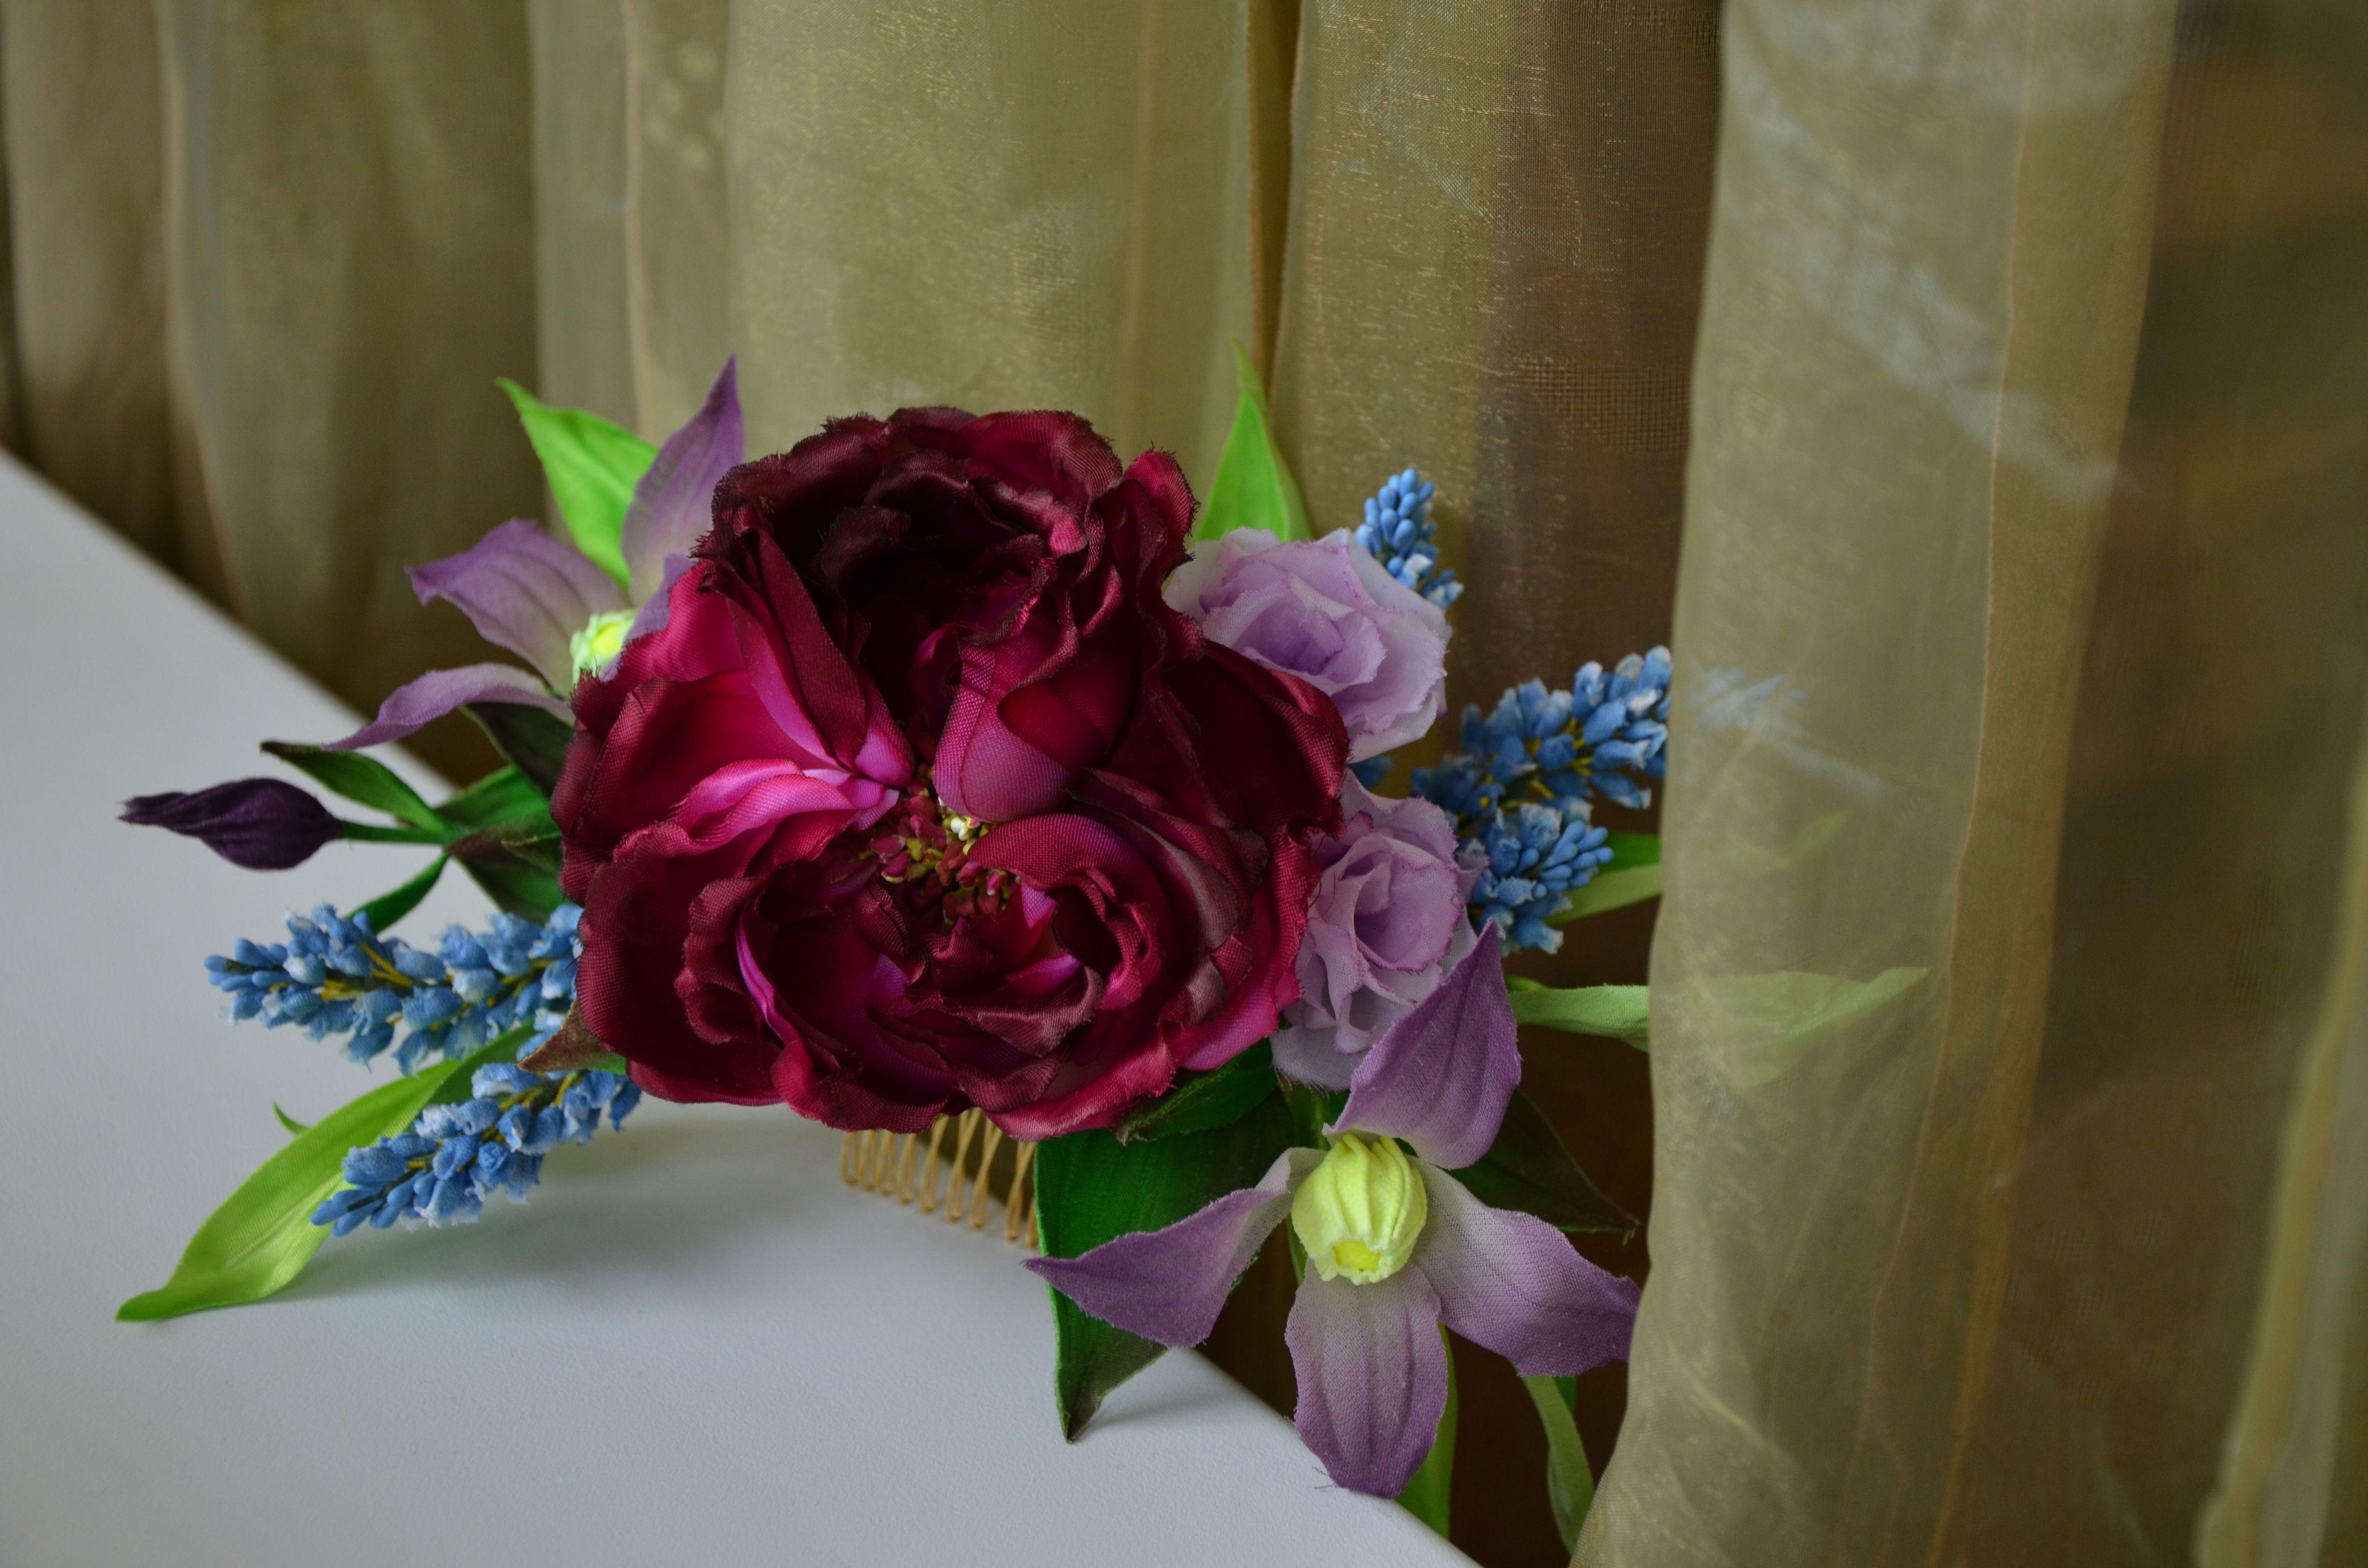 шелк аксессуар флористика гребень свадьба цветы подарок